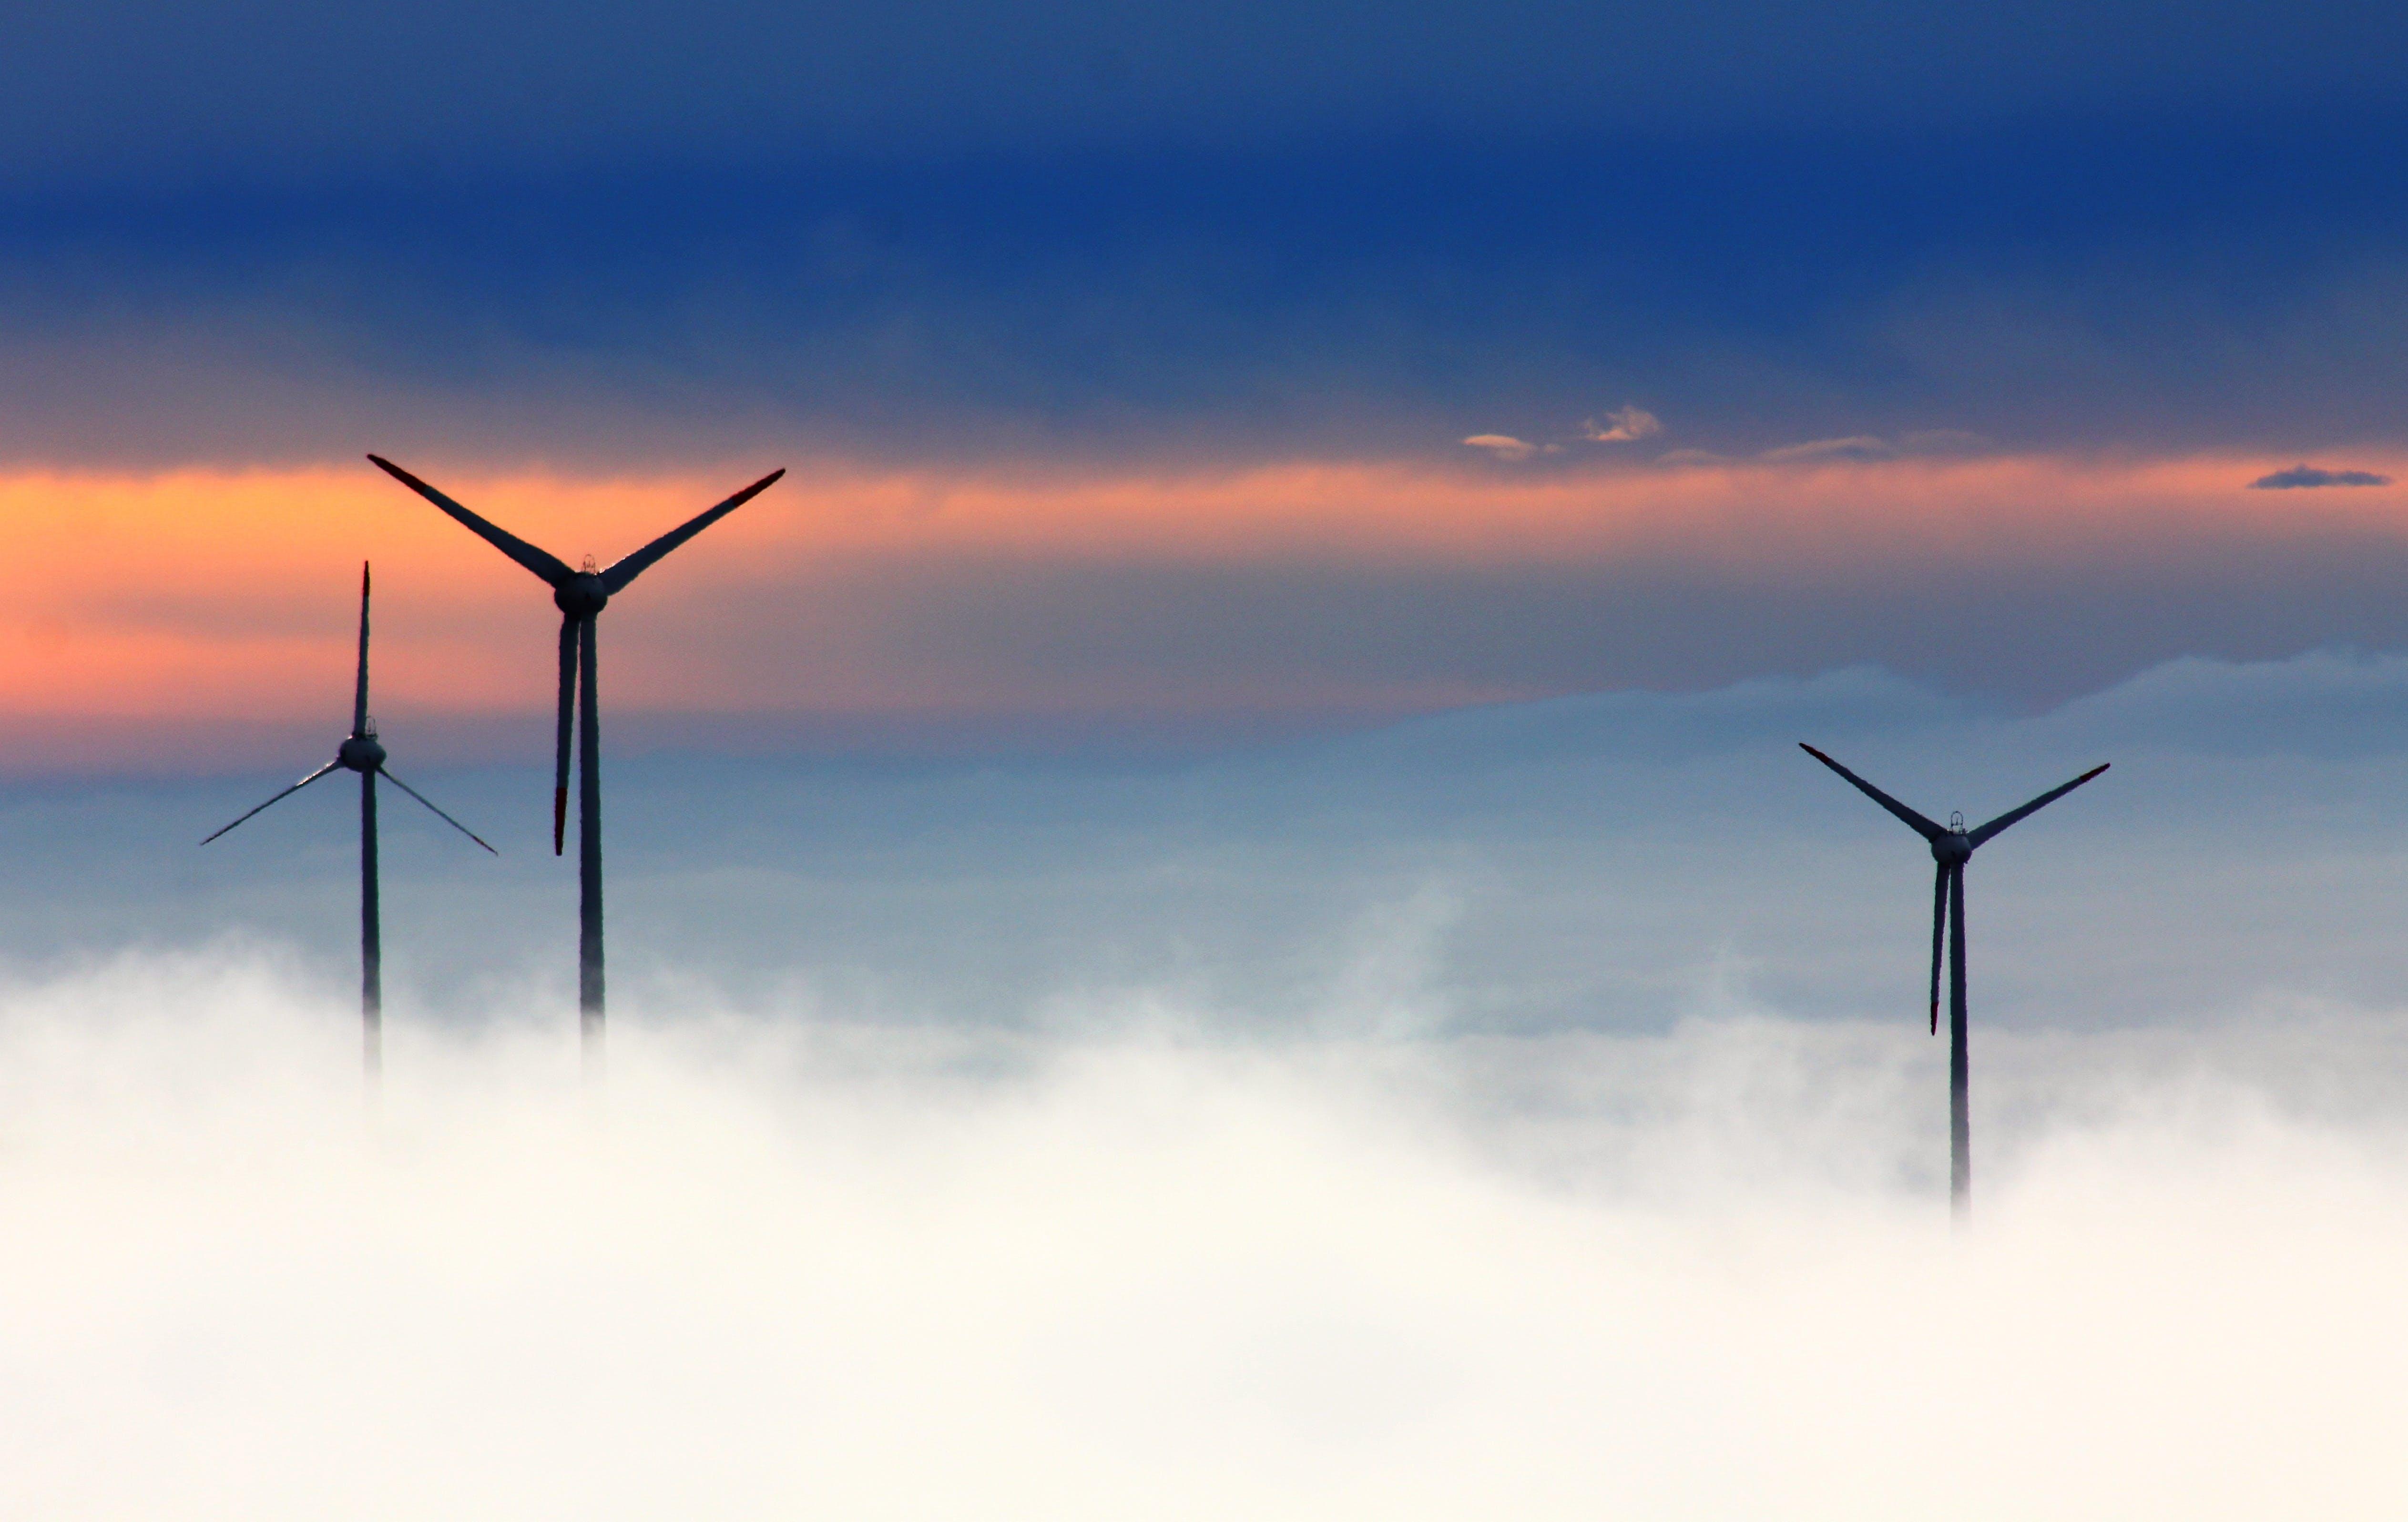 Kostenloses Stock Foto zu himmel, nebel, silhouette, windkraftanlagen